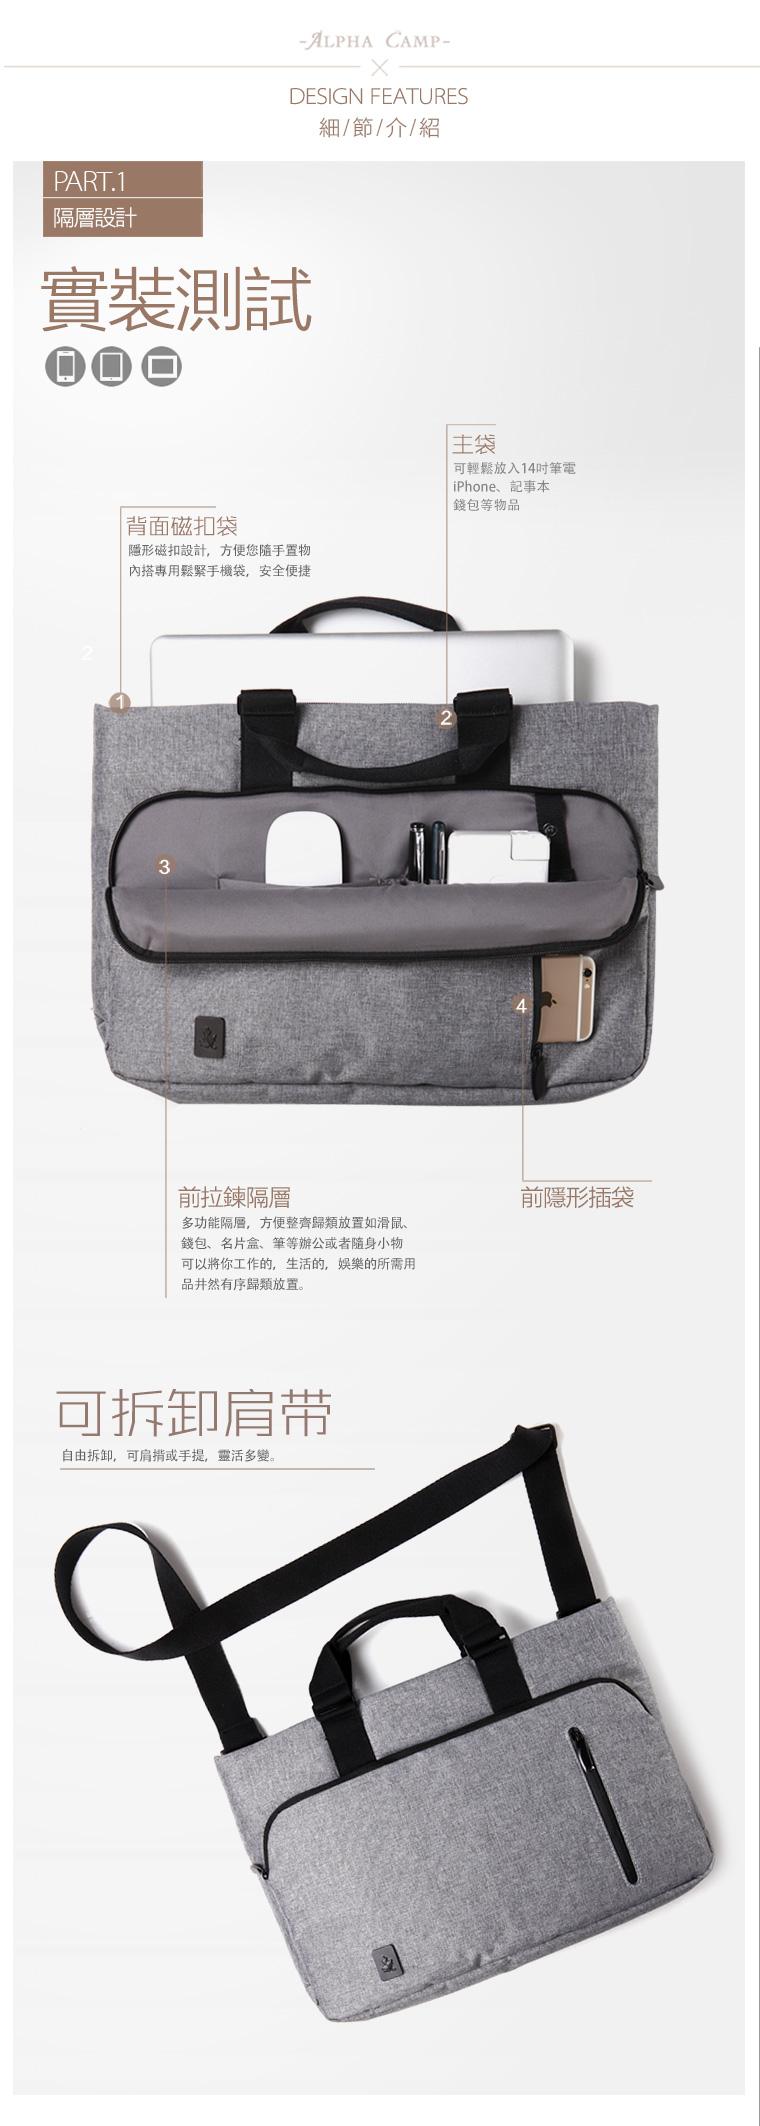 HK-08867_02